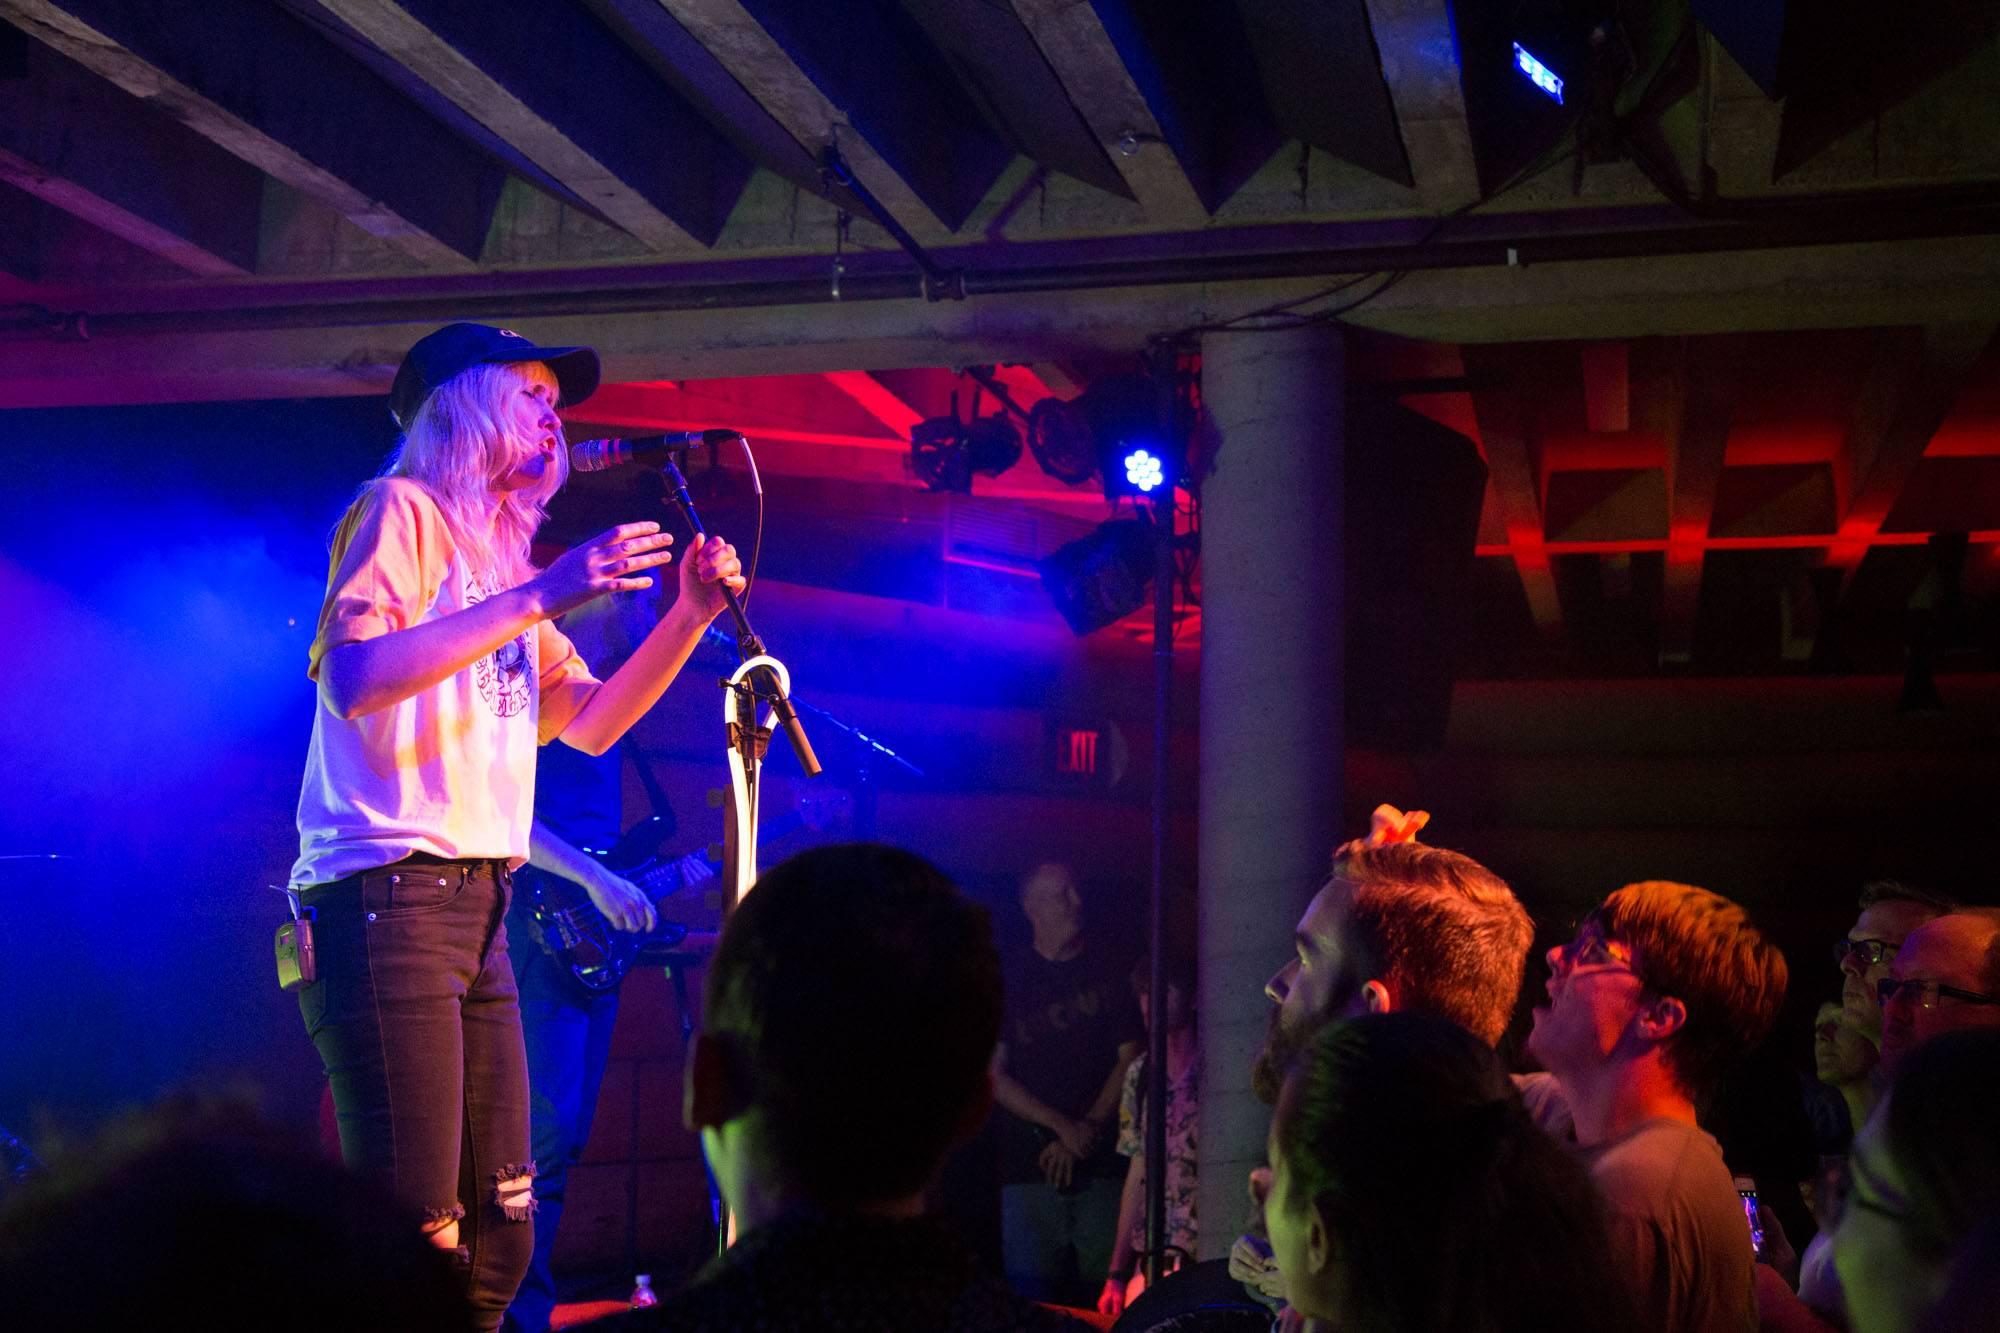 Ladyhawke at the Doug Fir Lounge, Portland, Jul 1 2016. Kirk Chantraine photo.